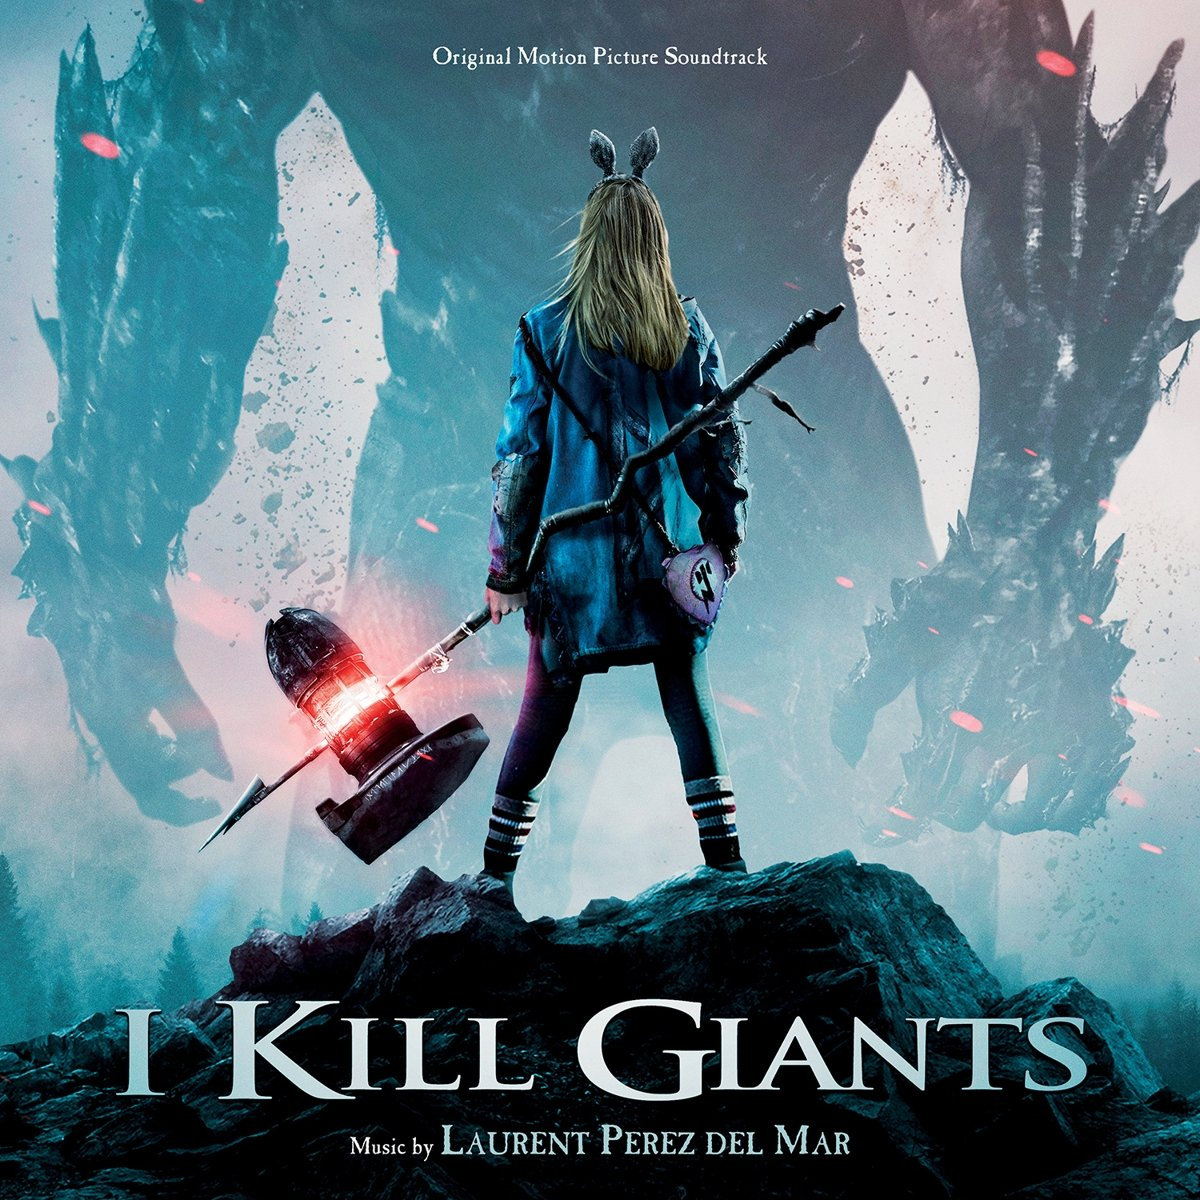 I Kill Giants: Original Motion Picture Soundtrack